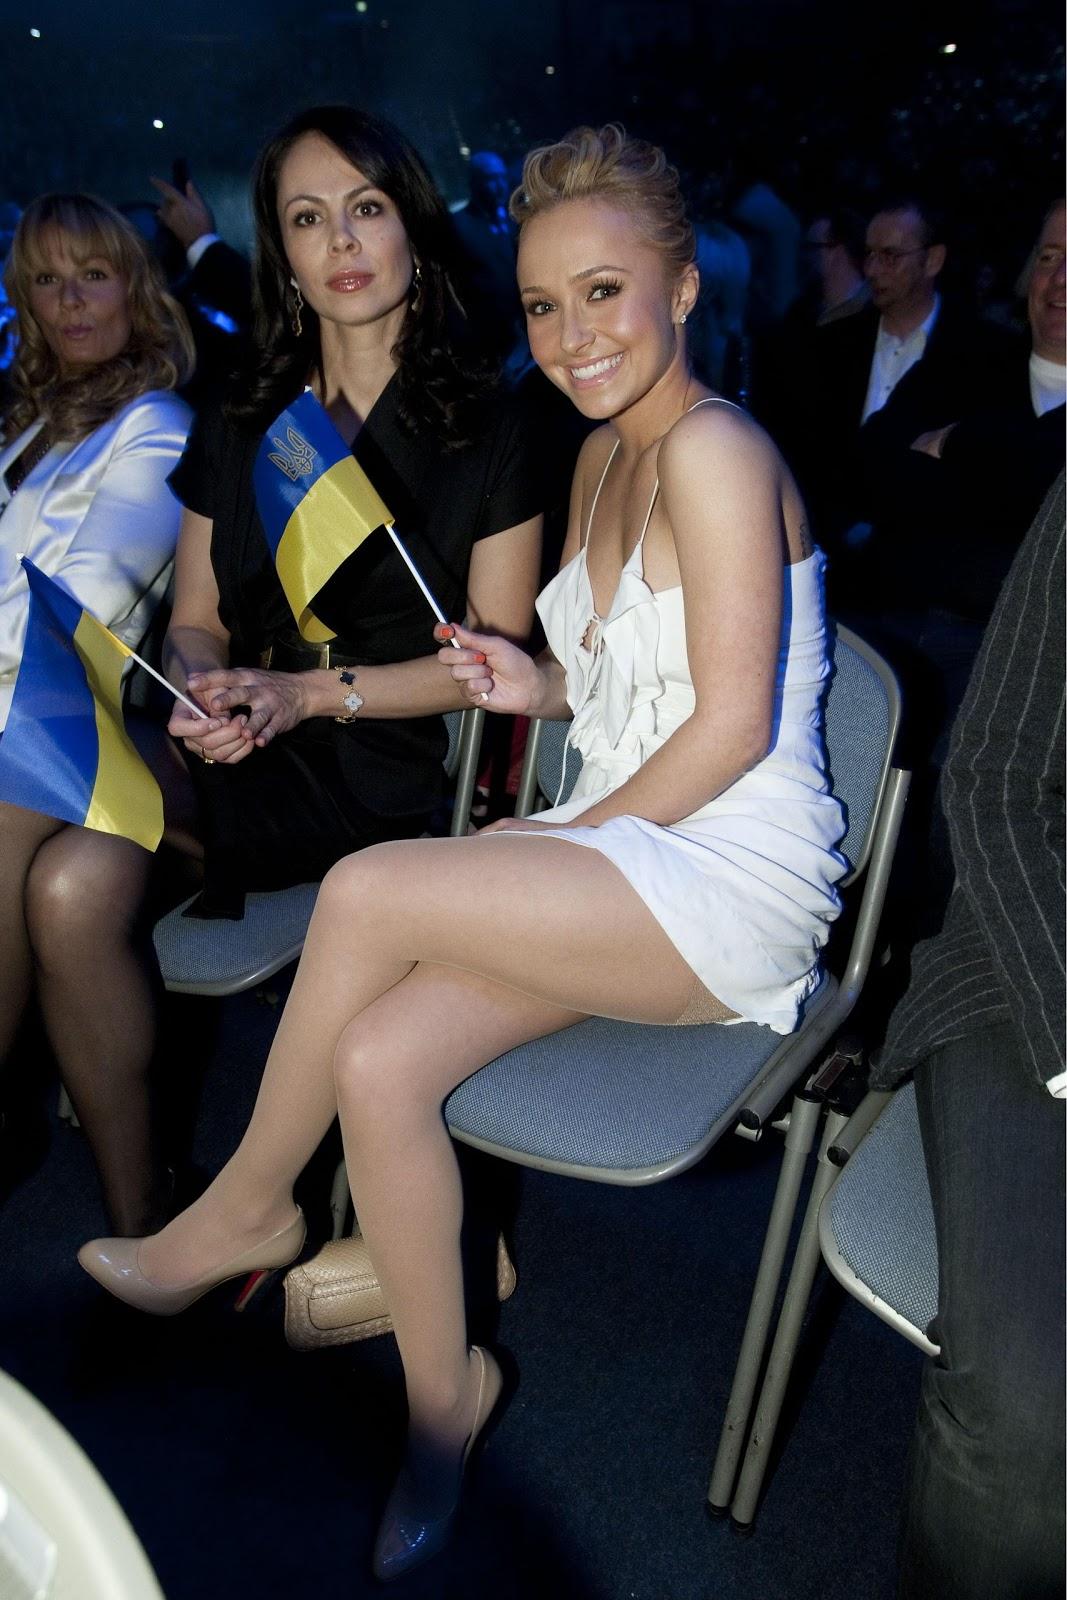 Alyson michalka dating 2011 4